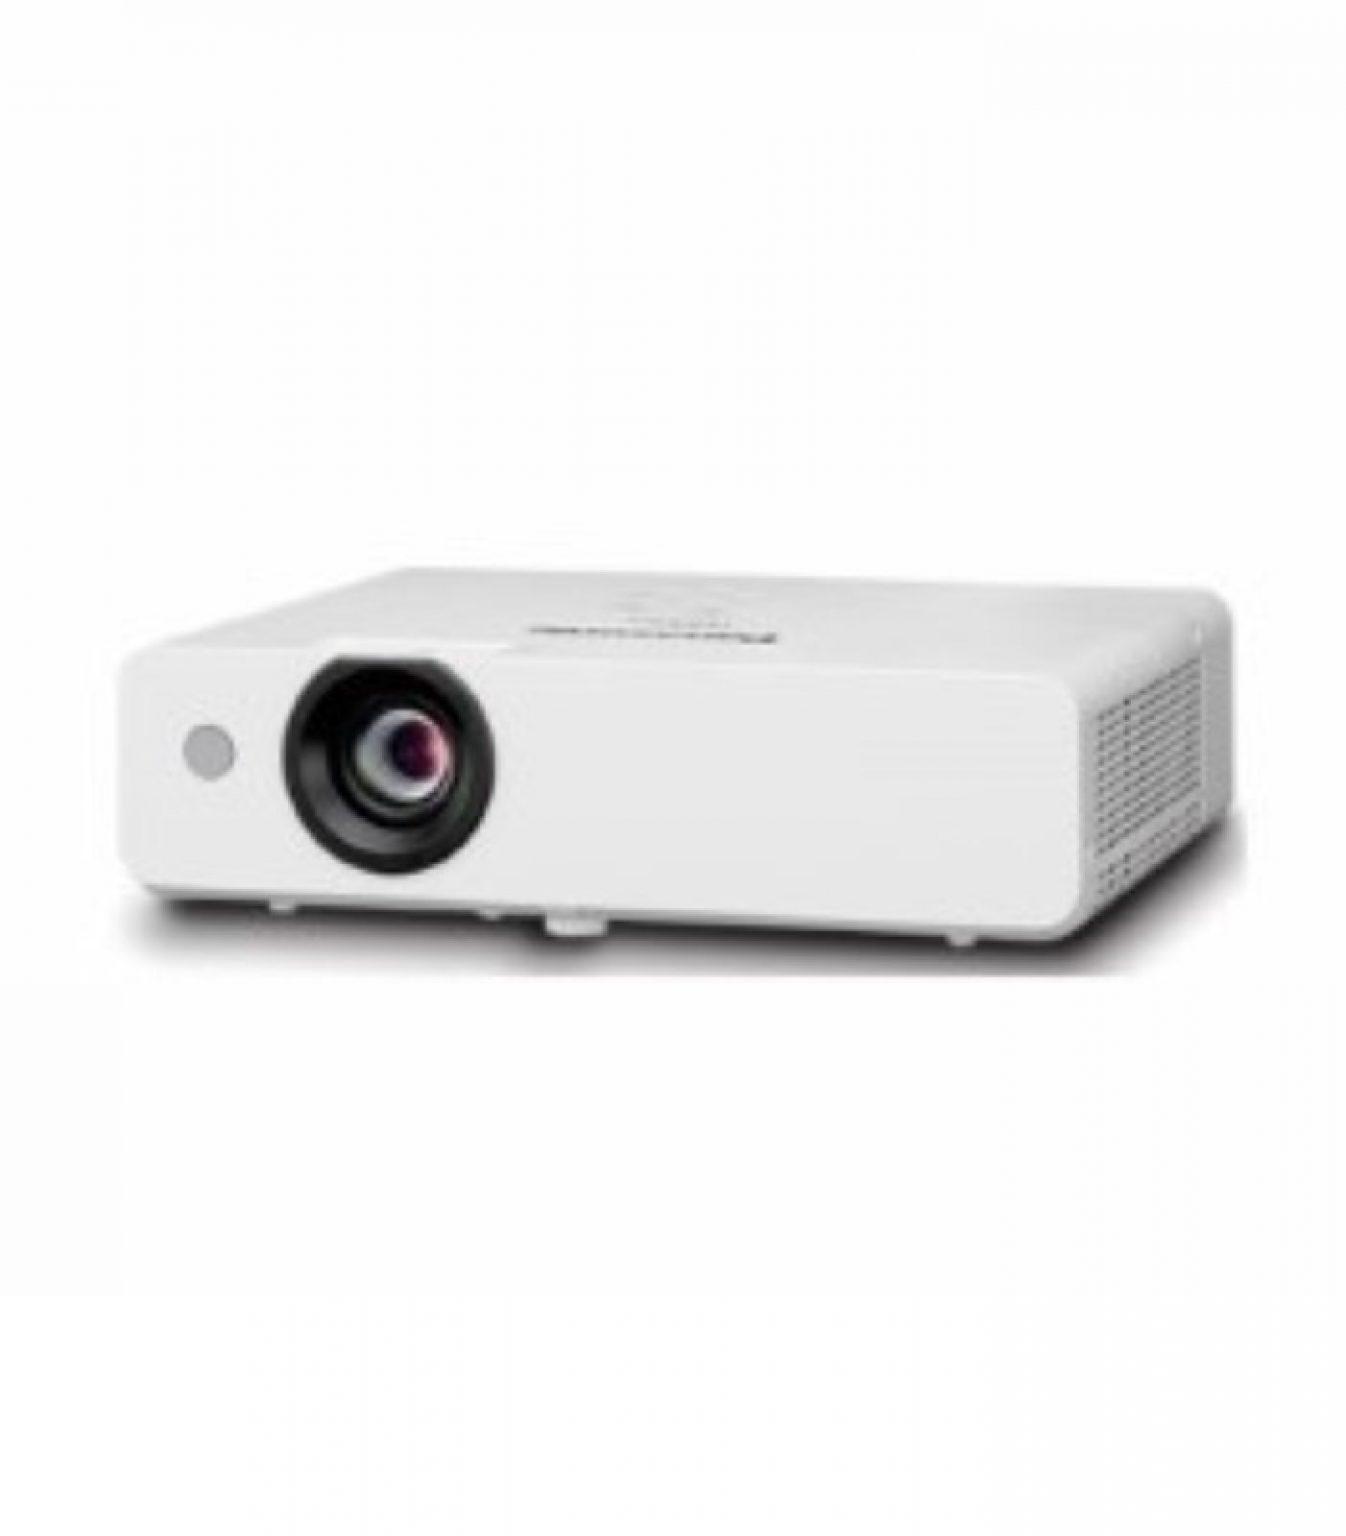 PANASONIC - Projector PT-LW375